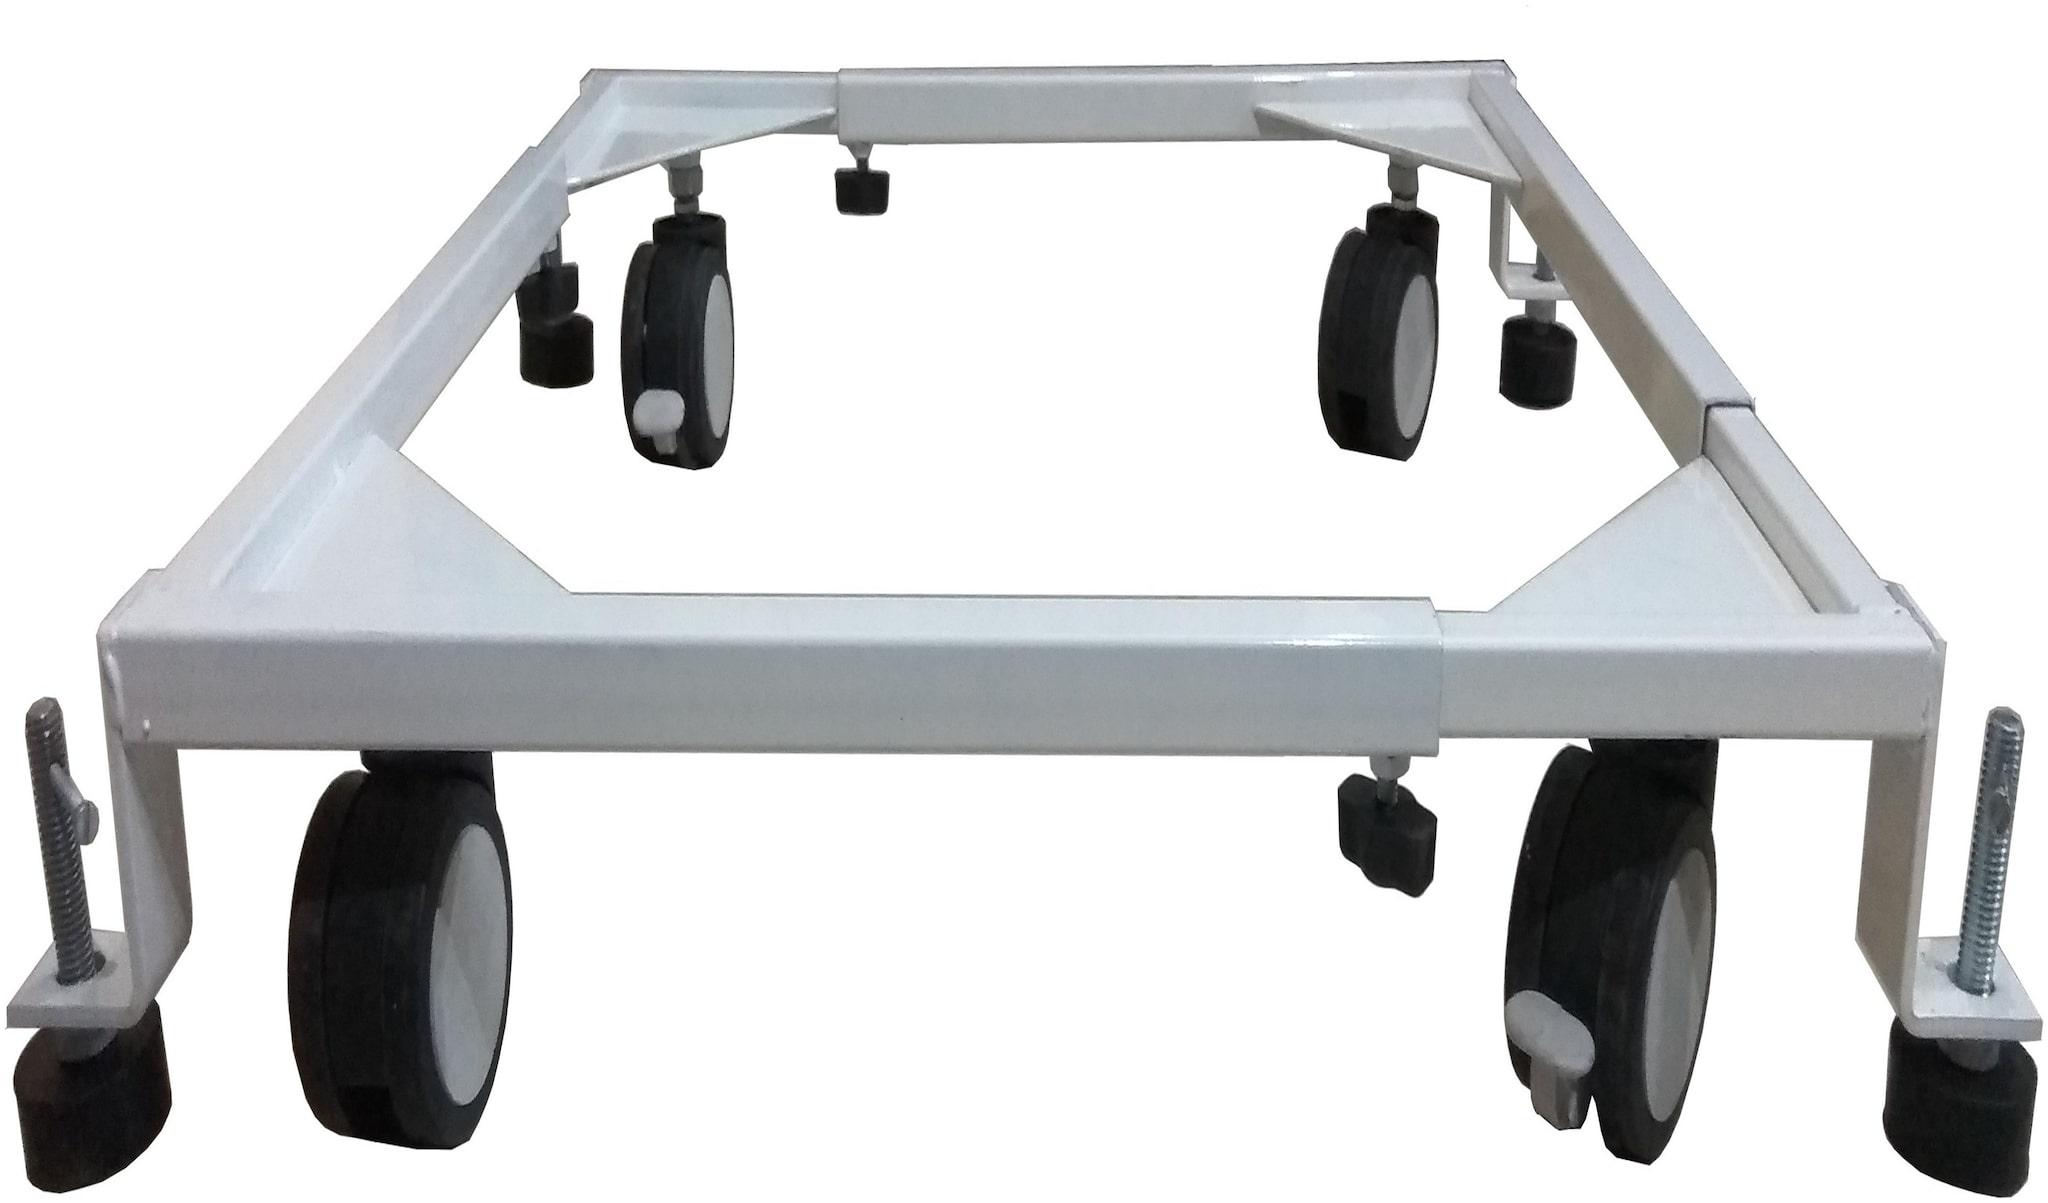 Smart Shelter Super Strong Size Adjustable Front / Top Loading Washing Machine...